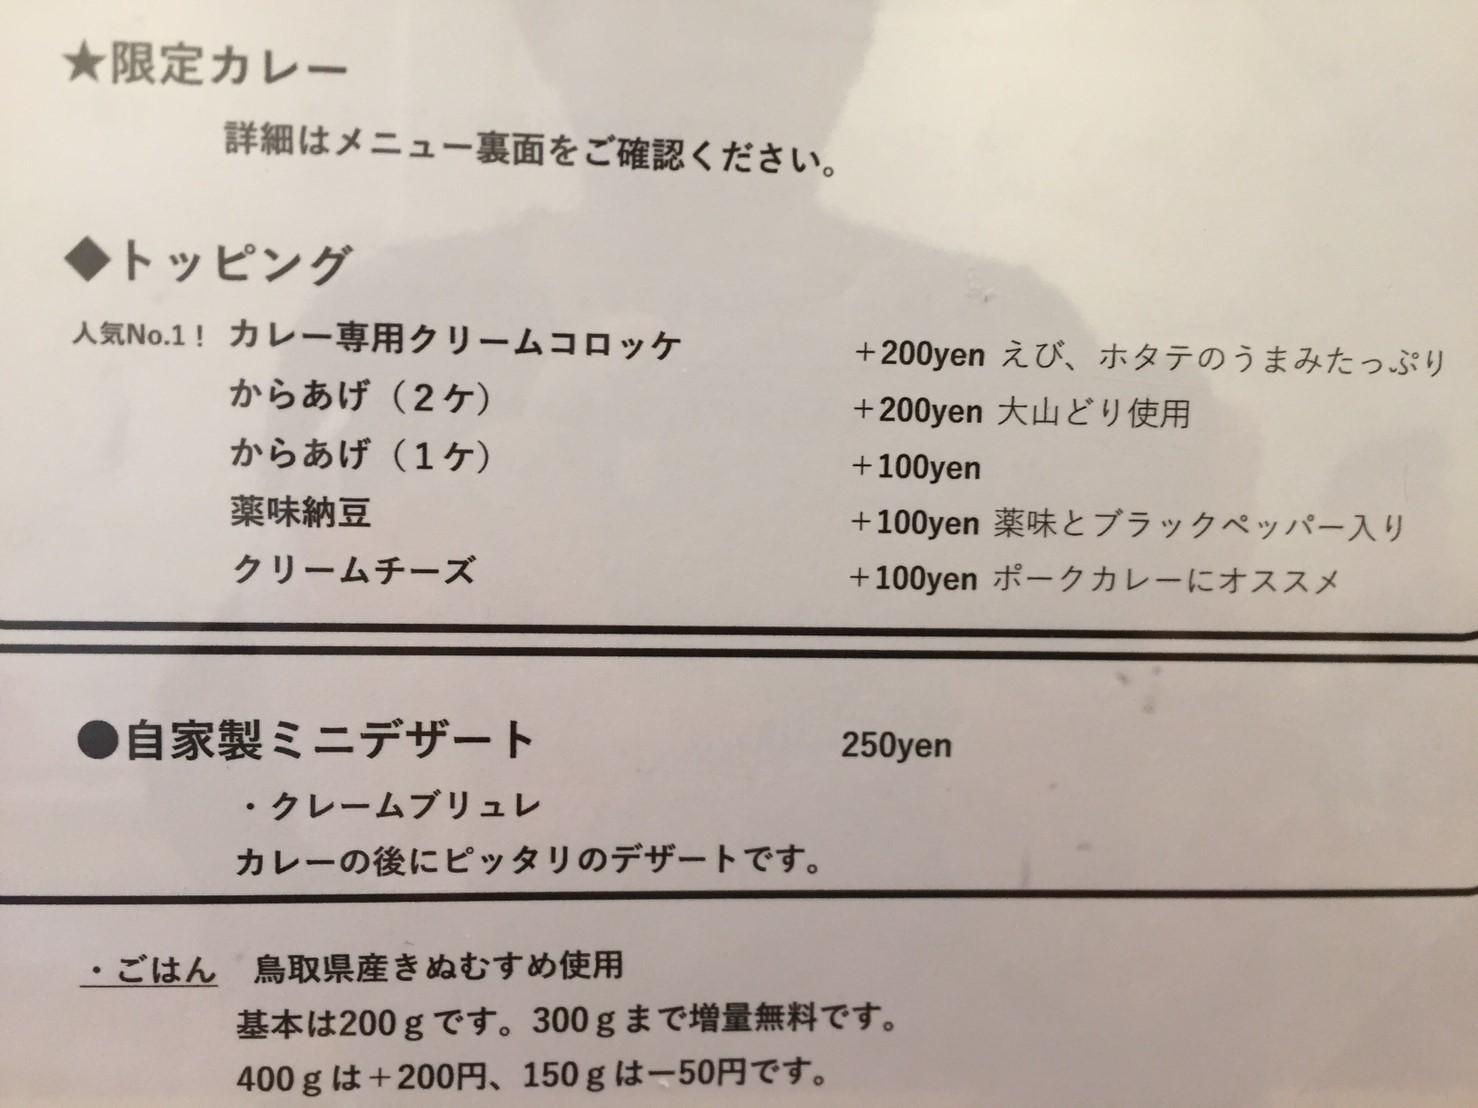 PARAKEET 限定カレー (金沢カレー風 ポークカツカレー)_e0115904_12402976.jpg